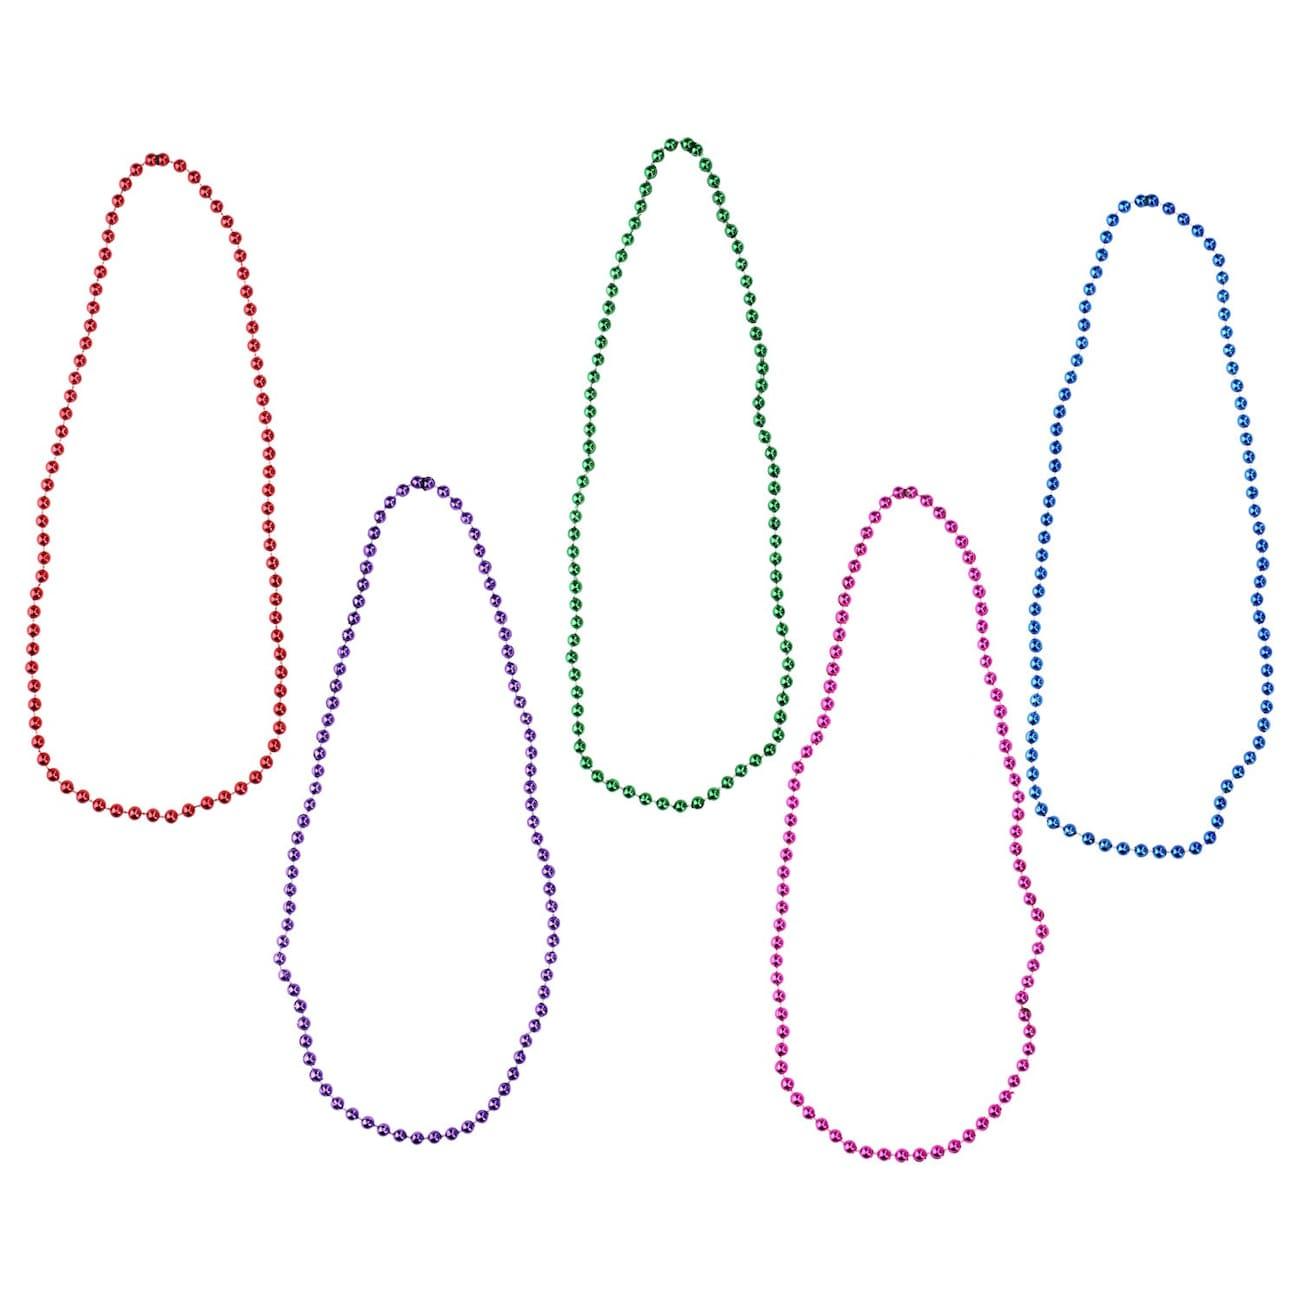 Necklace Gift Box Dollar Tree Inc